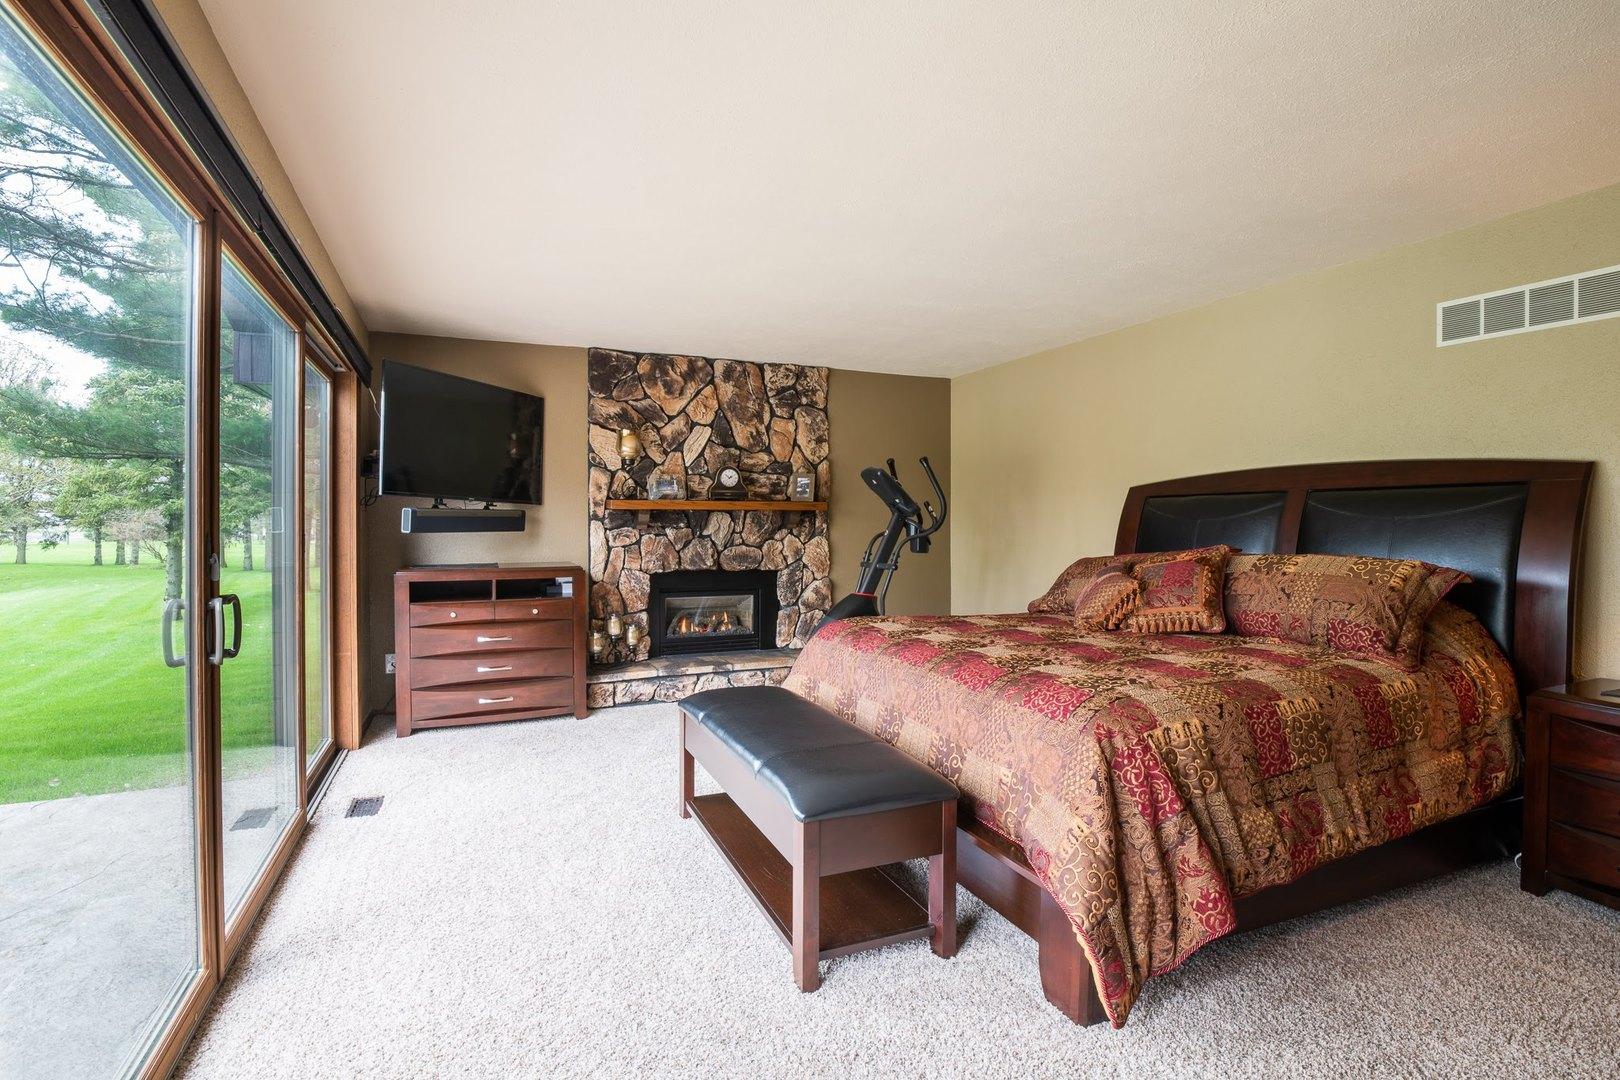 1413 East 550th, Lostant, Illinois, 61334